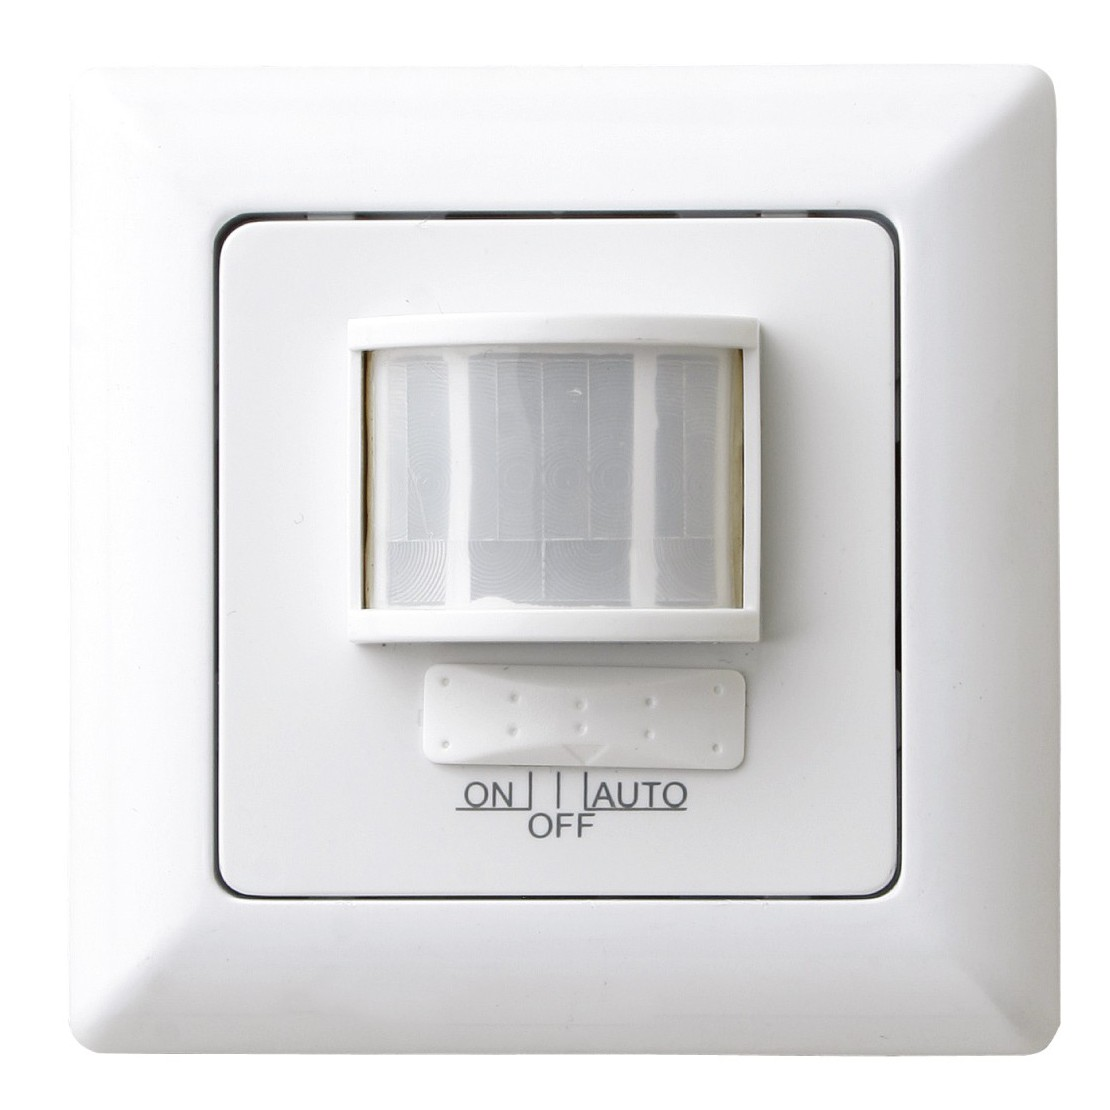 Detector de movimentocom interruptor 180° Encastrar - Branco